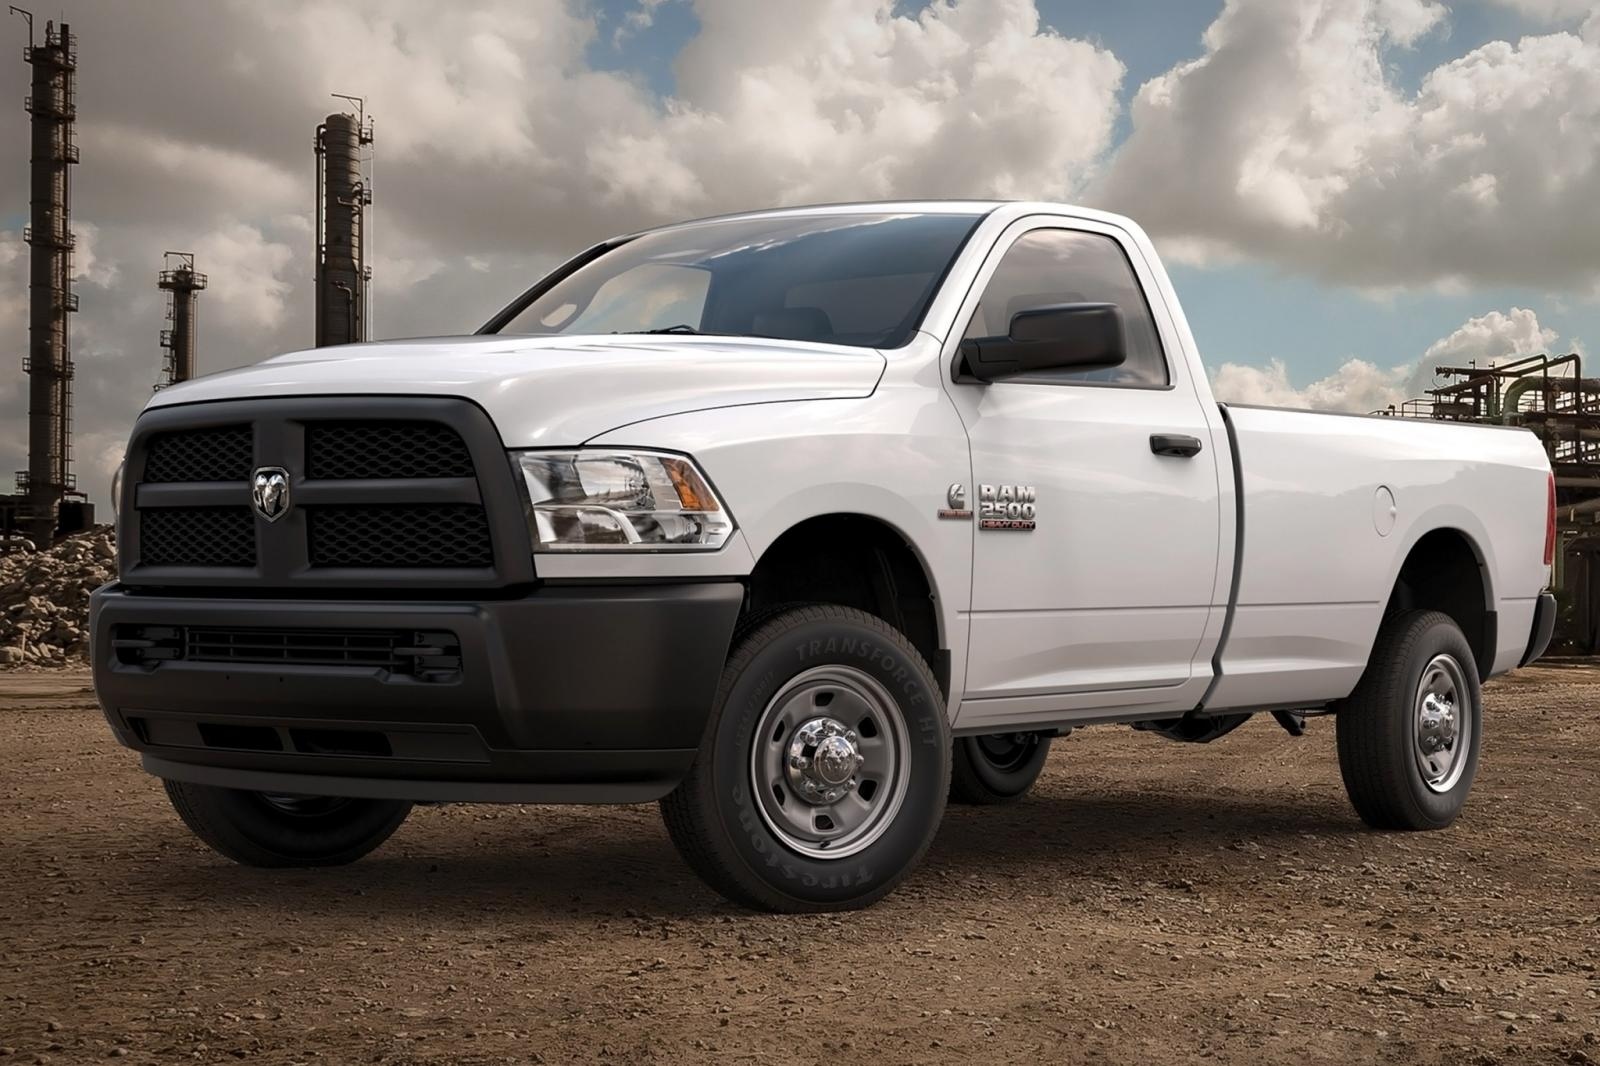 800 1024 1280 1600 origin 2014 ram 2500 - Dodge Ram 2500 2014 White